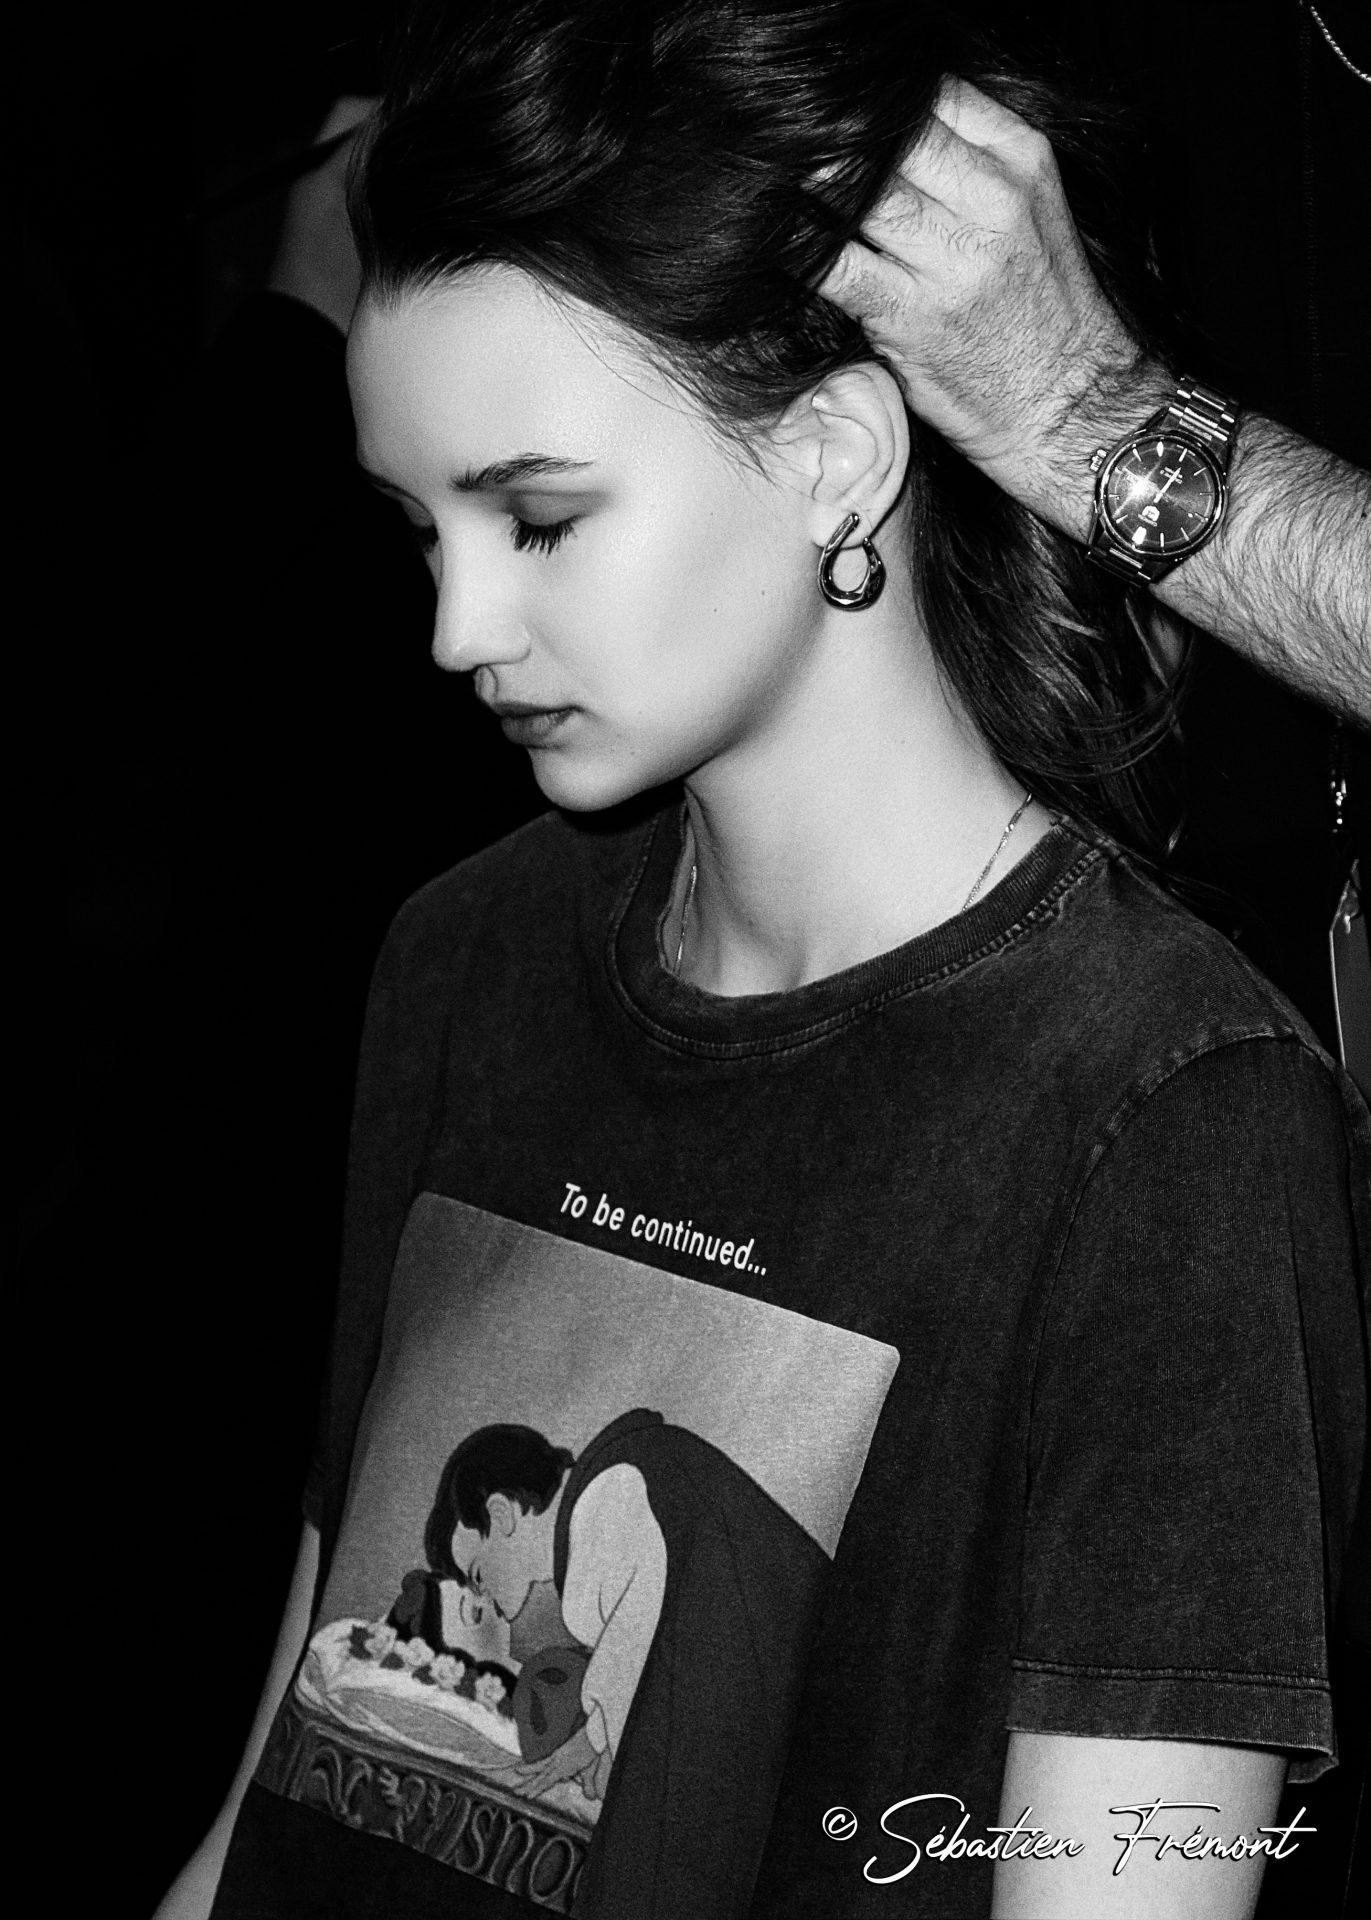 French Photographer Fashion Photography Tatras / Backstage